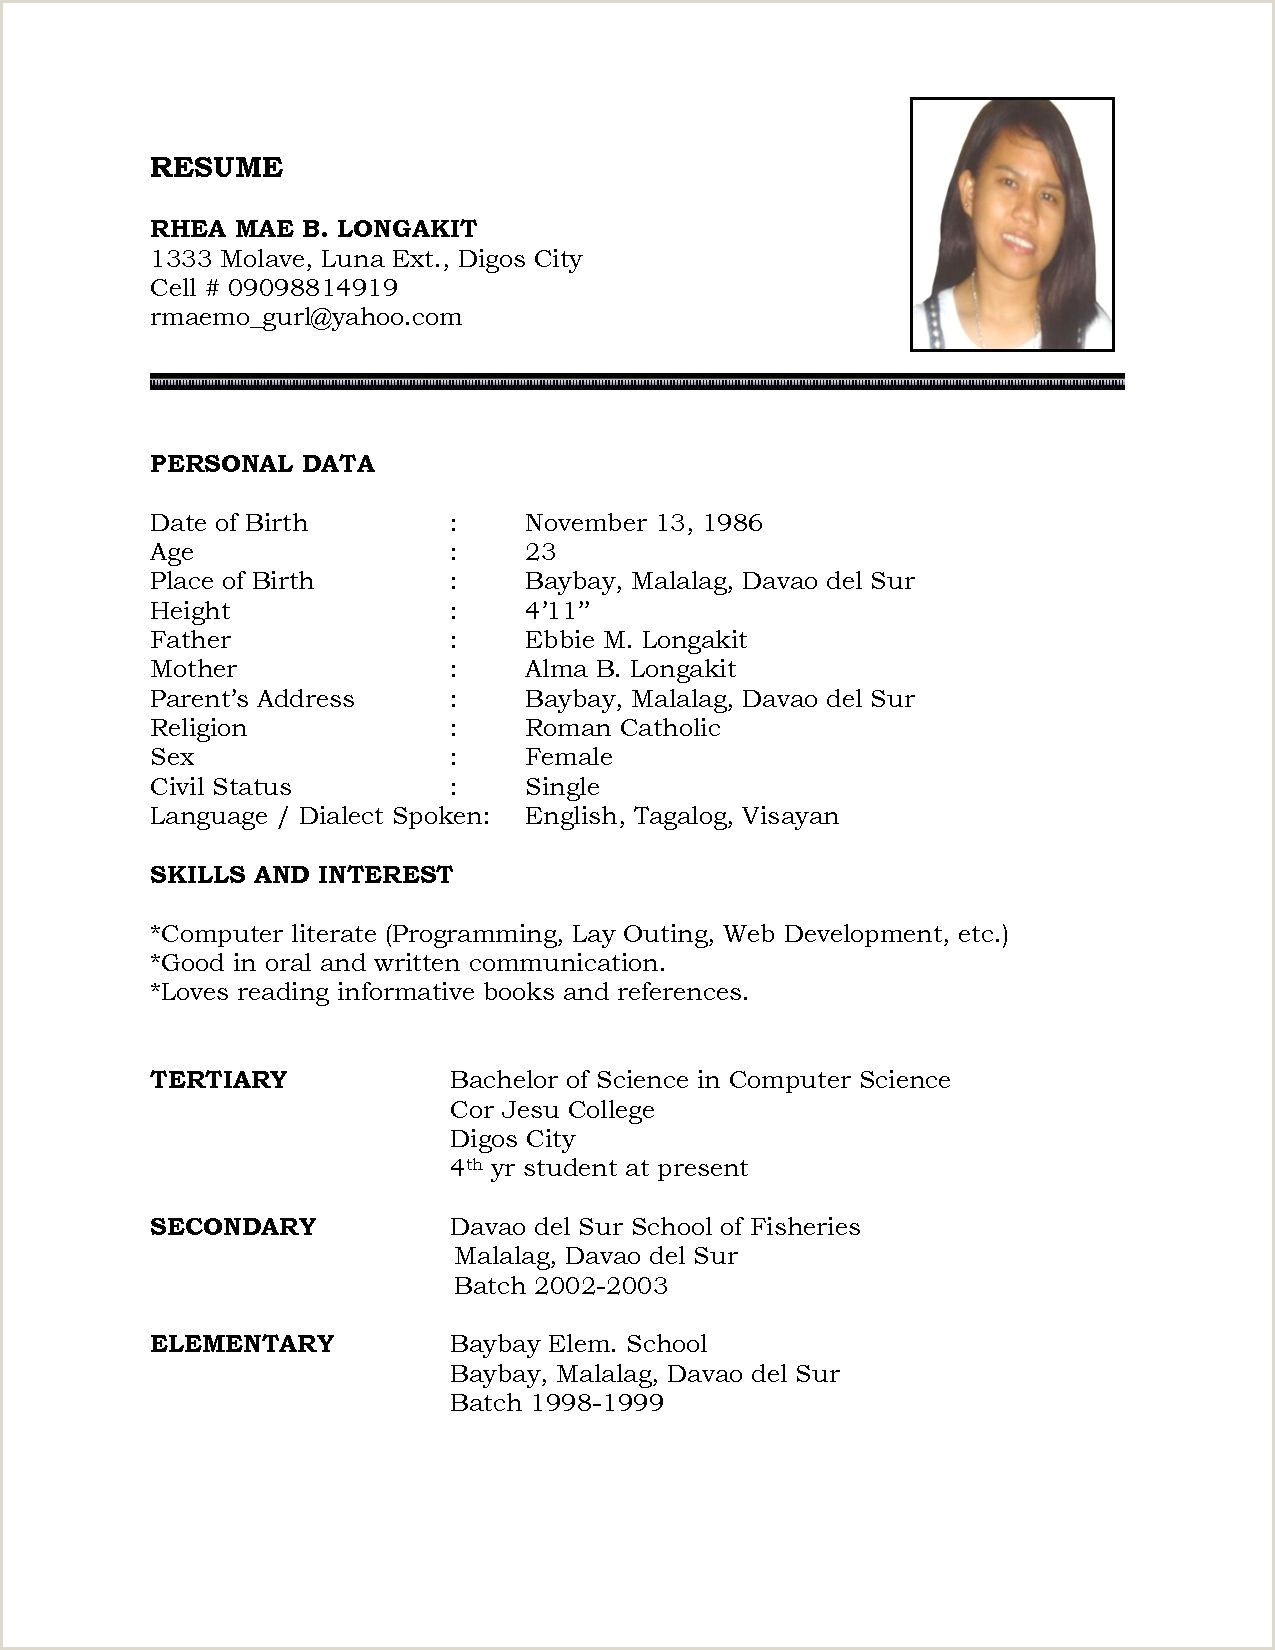 German Standard Cv format for Job 3 Resume format